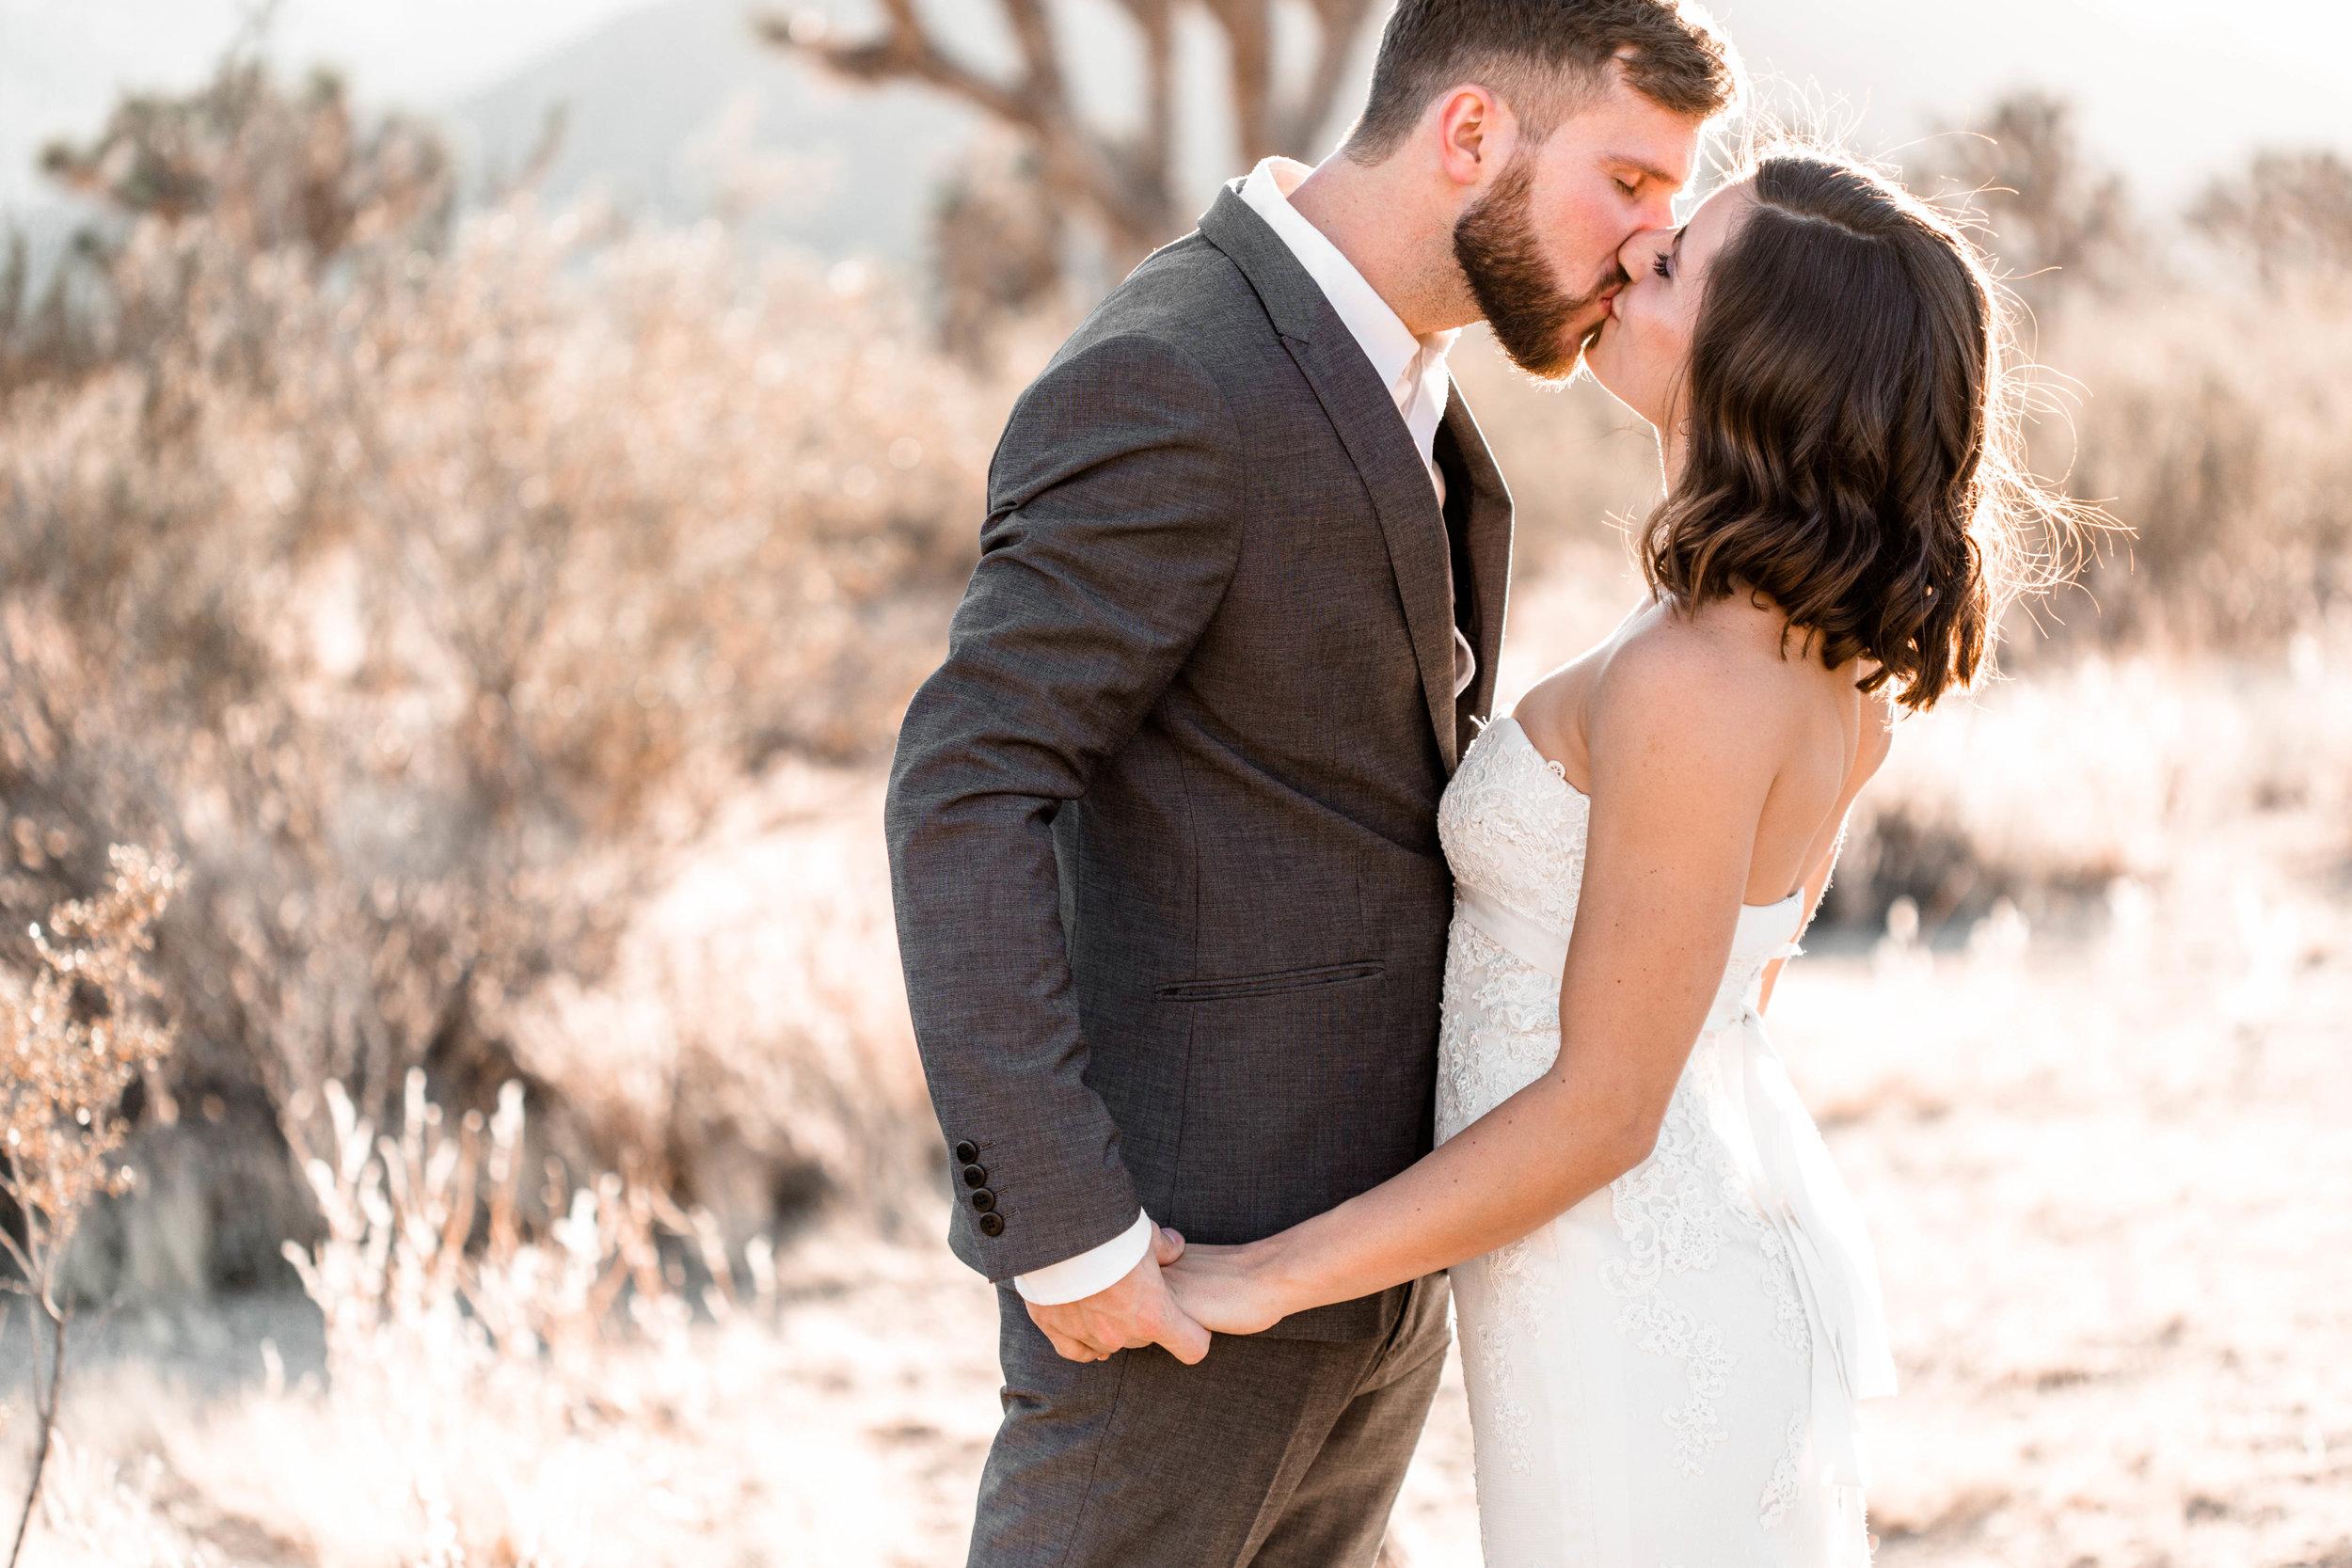 nicole-daacke-photography-joshua-tree-adventurous-elopement-wedding-national-park-wedding-photographer-adventure-wedding-adventurous-elopement-jtree-joshua-tree-national-park-wedding-photographer-intimate-weddings-golden-desert-love-6.jpg